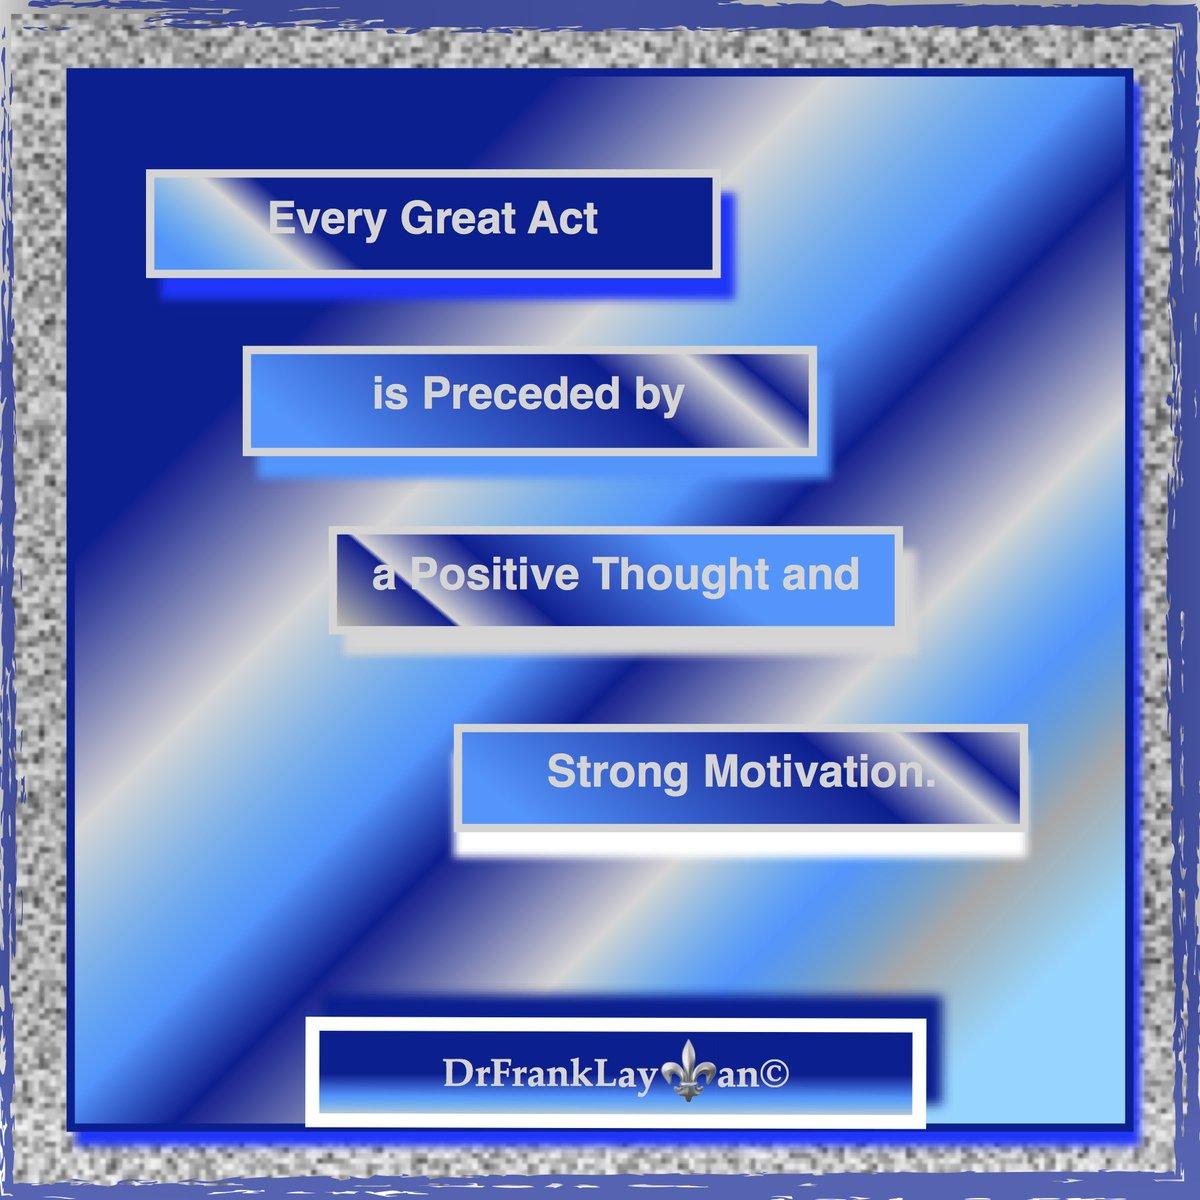 Every Great Act.@DrSTLT Keep Climbing.#DrFrankLayman @KevinGarciaTW   #positivethoughts      #motivational #author #writer    #selfhelp #LeadershipMatters    #positivemindset    https:// lowepublishing.com/author      https:// lowepublishing.com     Author #books   https://www. amazon.com/s?i=stripbooks &rh=p_27%3ADr.+Frank+Layman&s=relevancerank&text=Dr.+Frank+Layman&ref=dp_byline_sr_book_1  … <br>http://pic.twitter.com/1Kpp27xca7